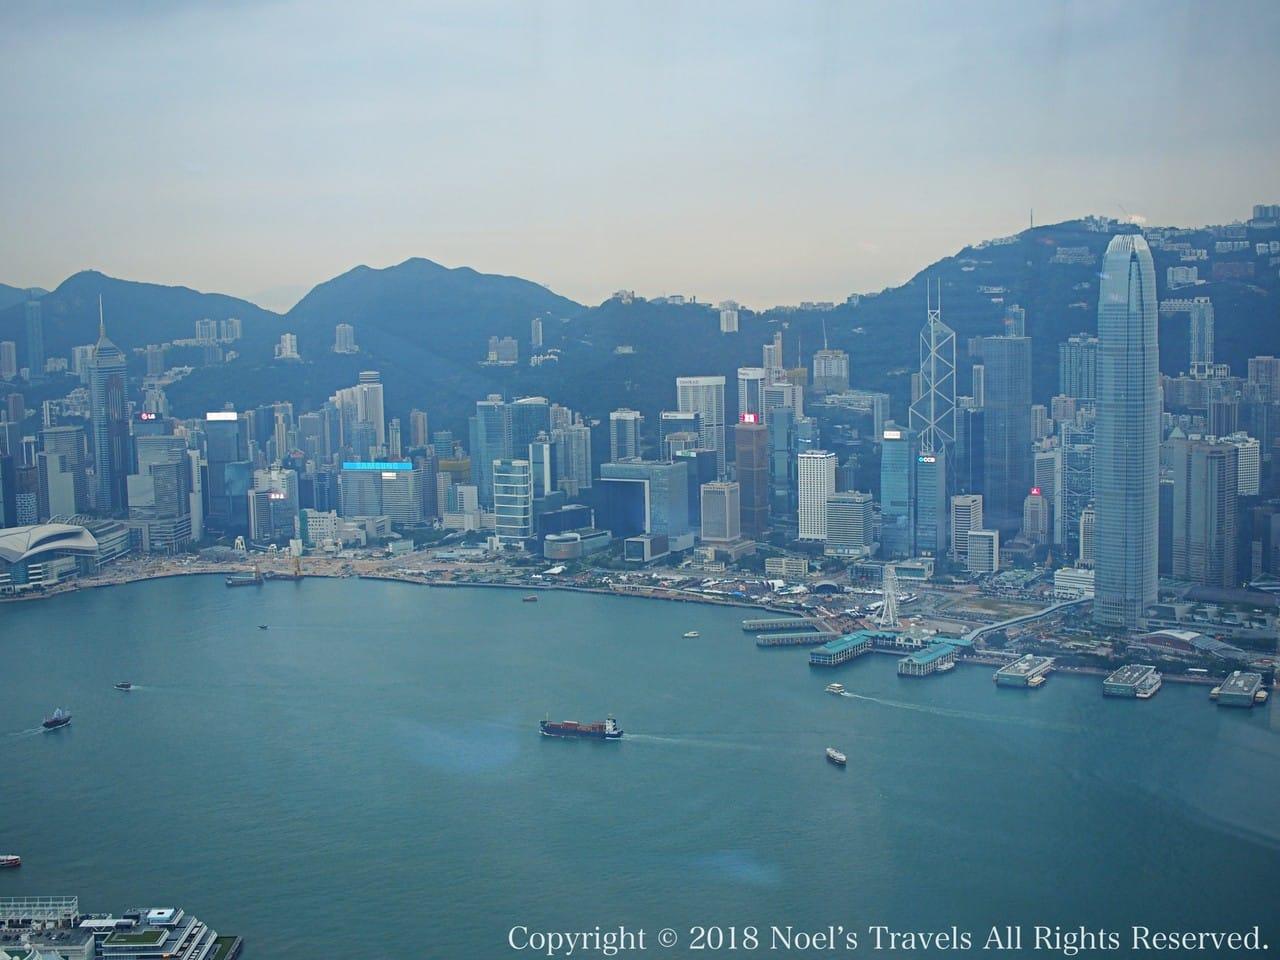 Sky100から見たビクトリア湾と香港の高層ビル群